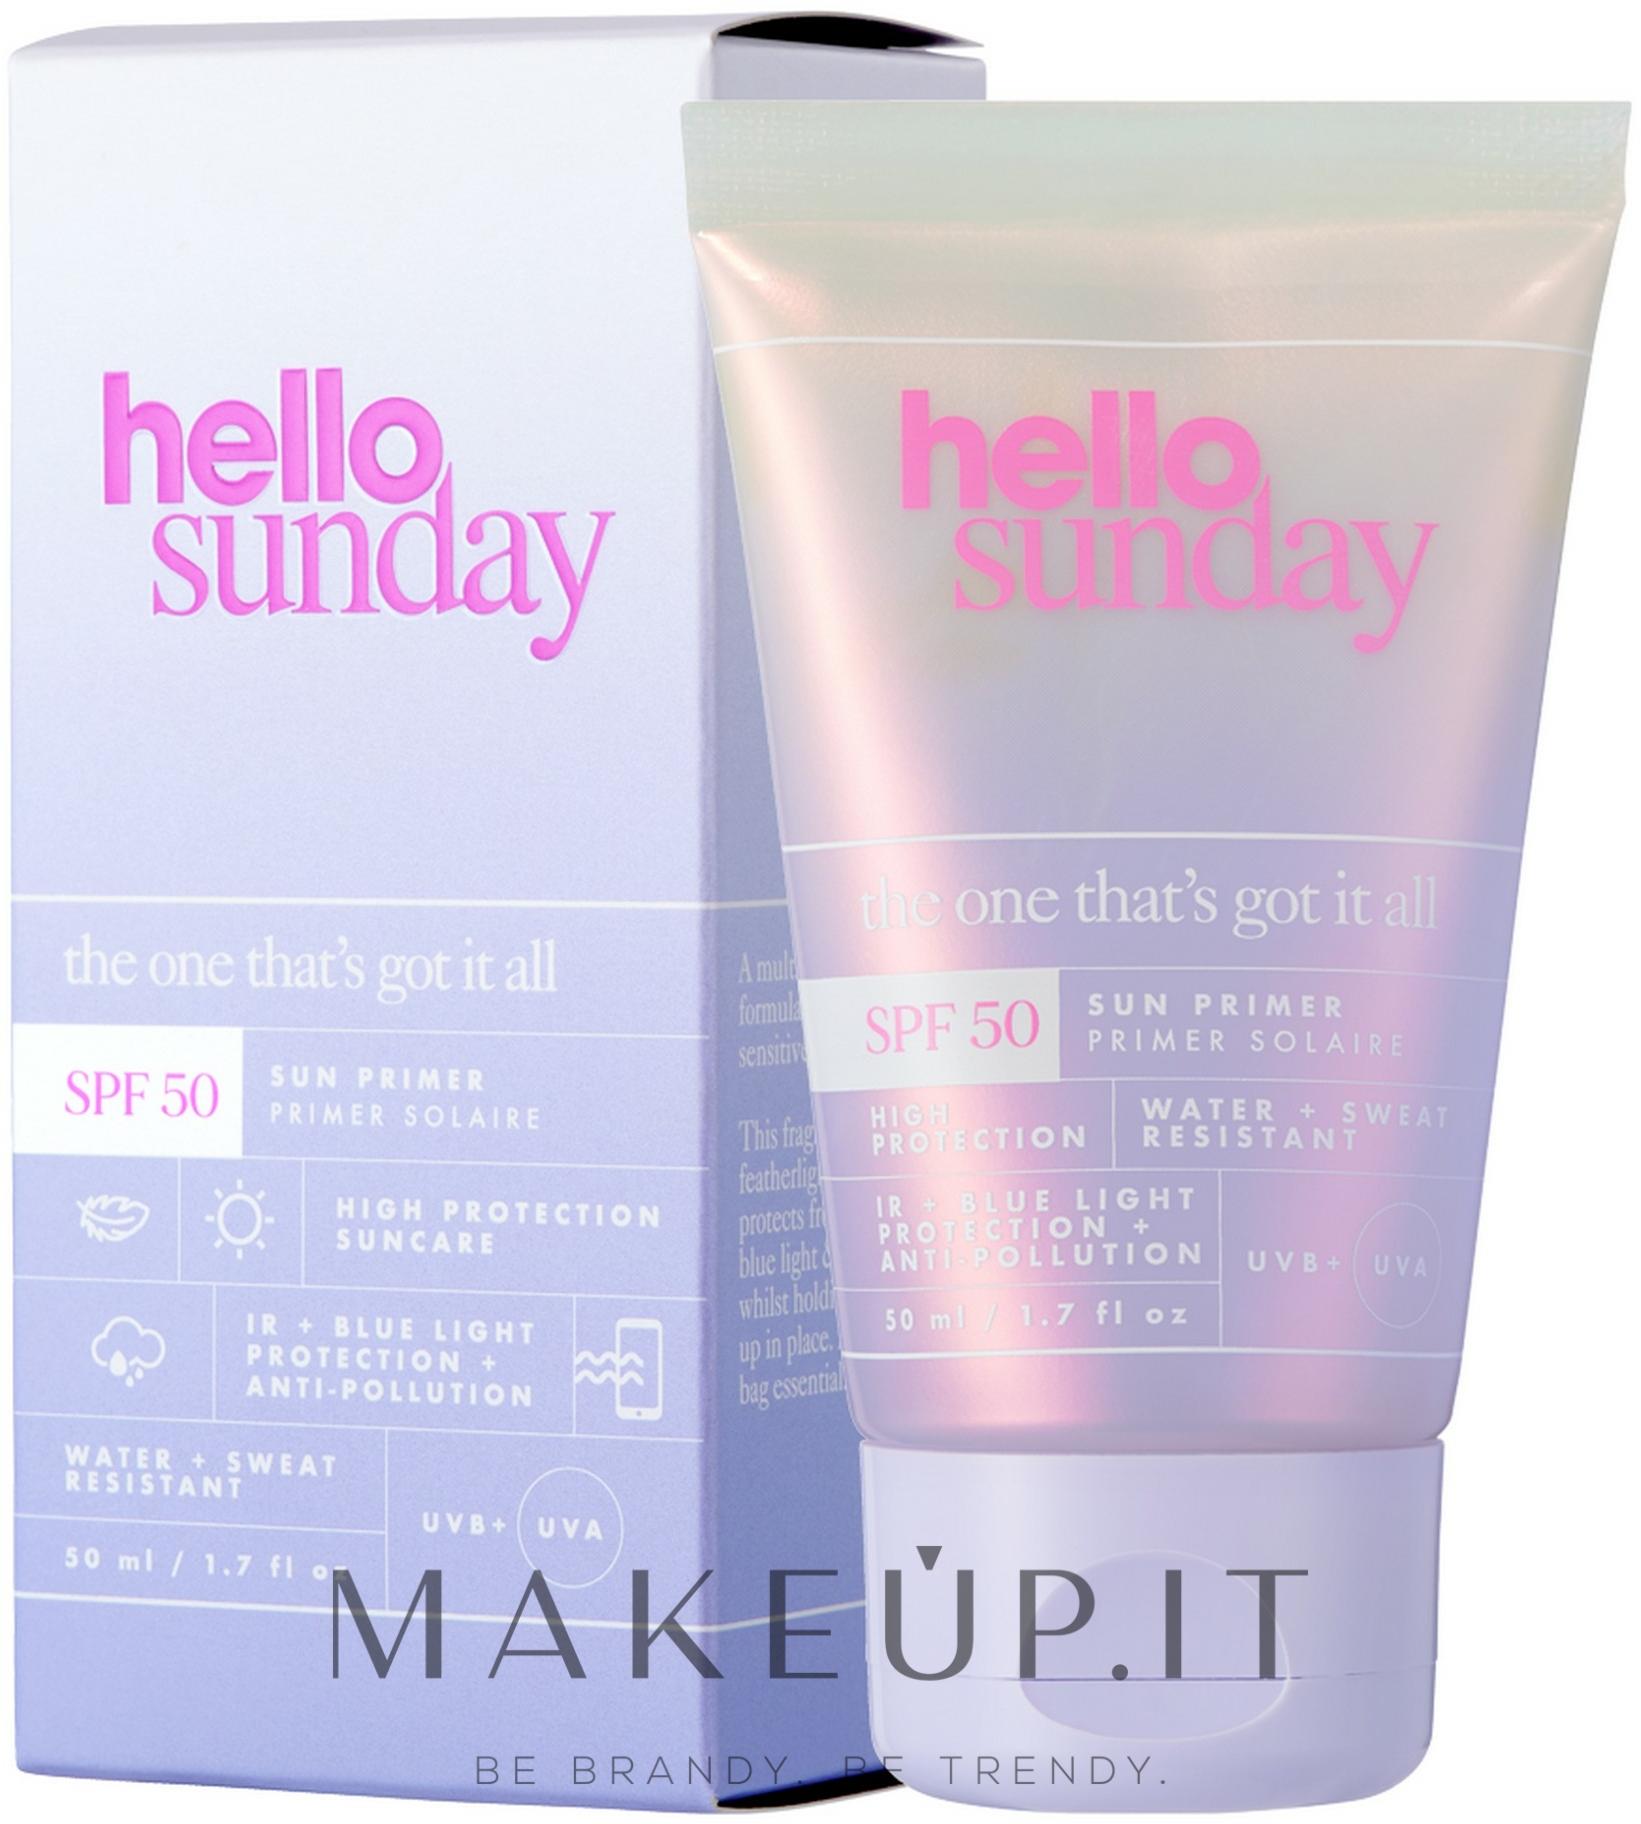 Primer viso SPF 50 - Hello Sunday The One That's Got it All Face Primer SPF50 — foto 50 ml